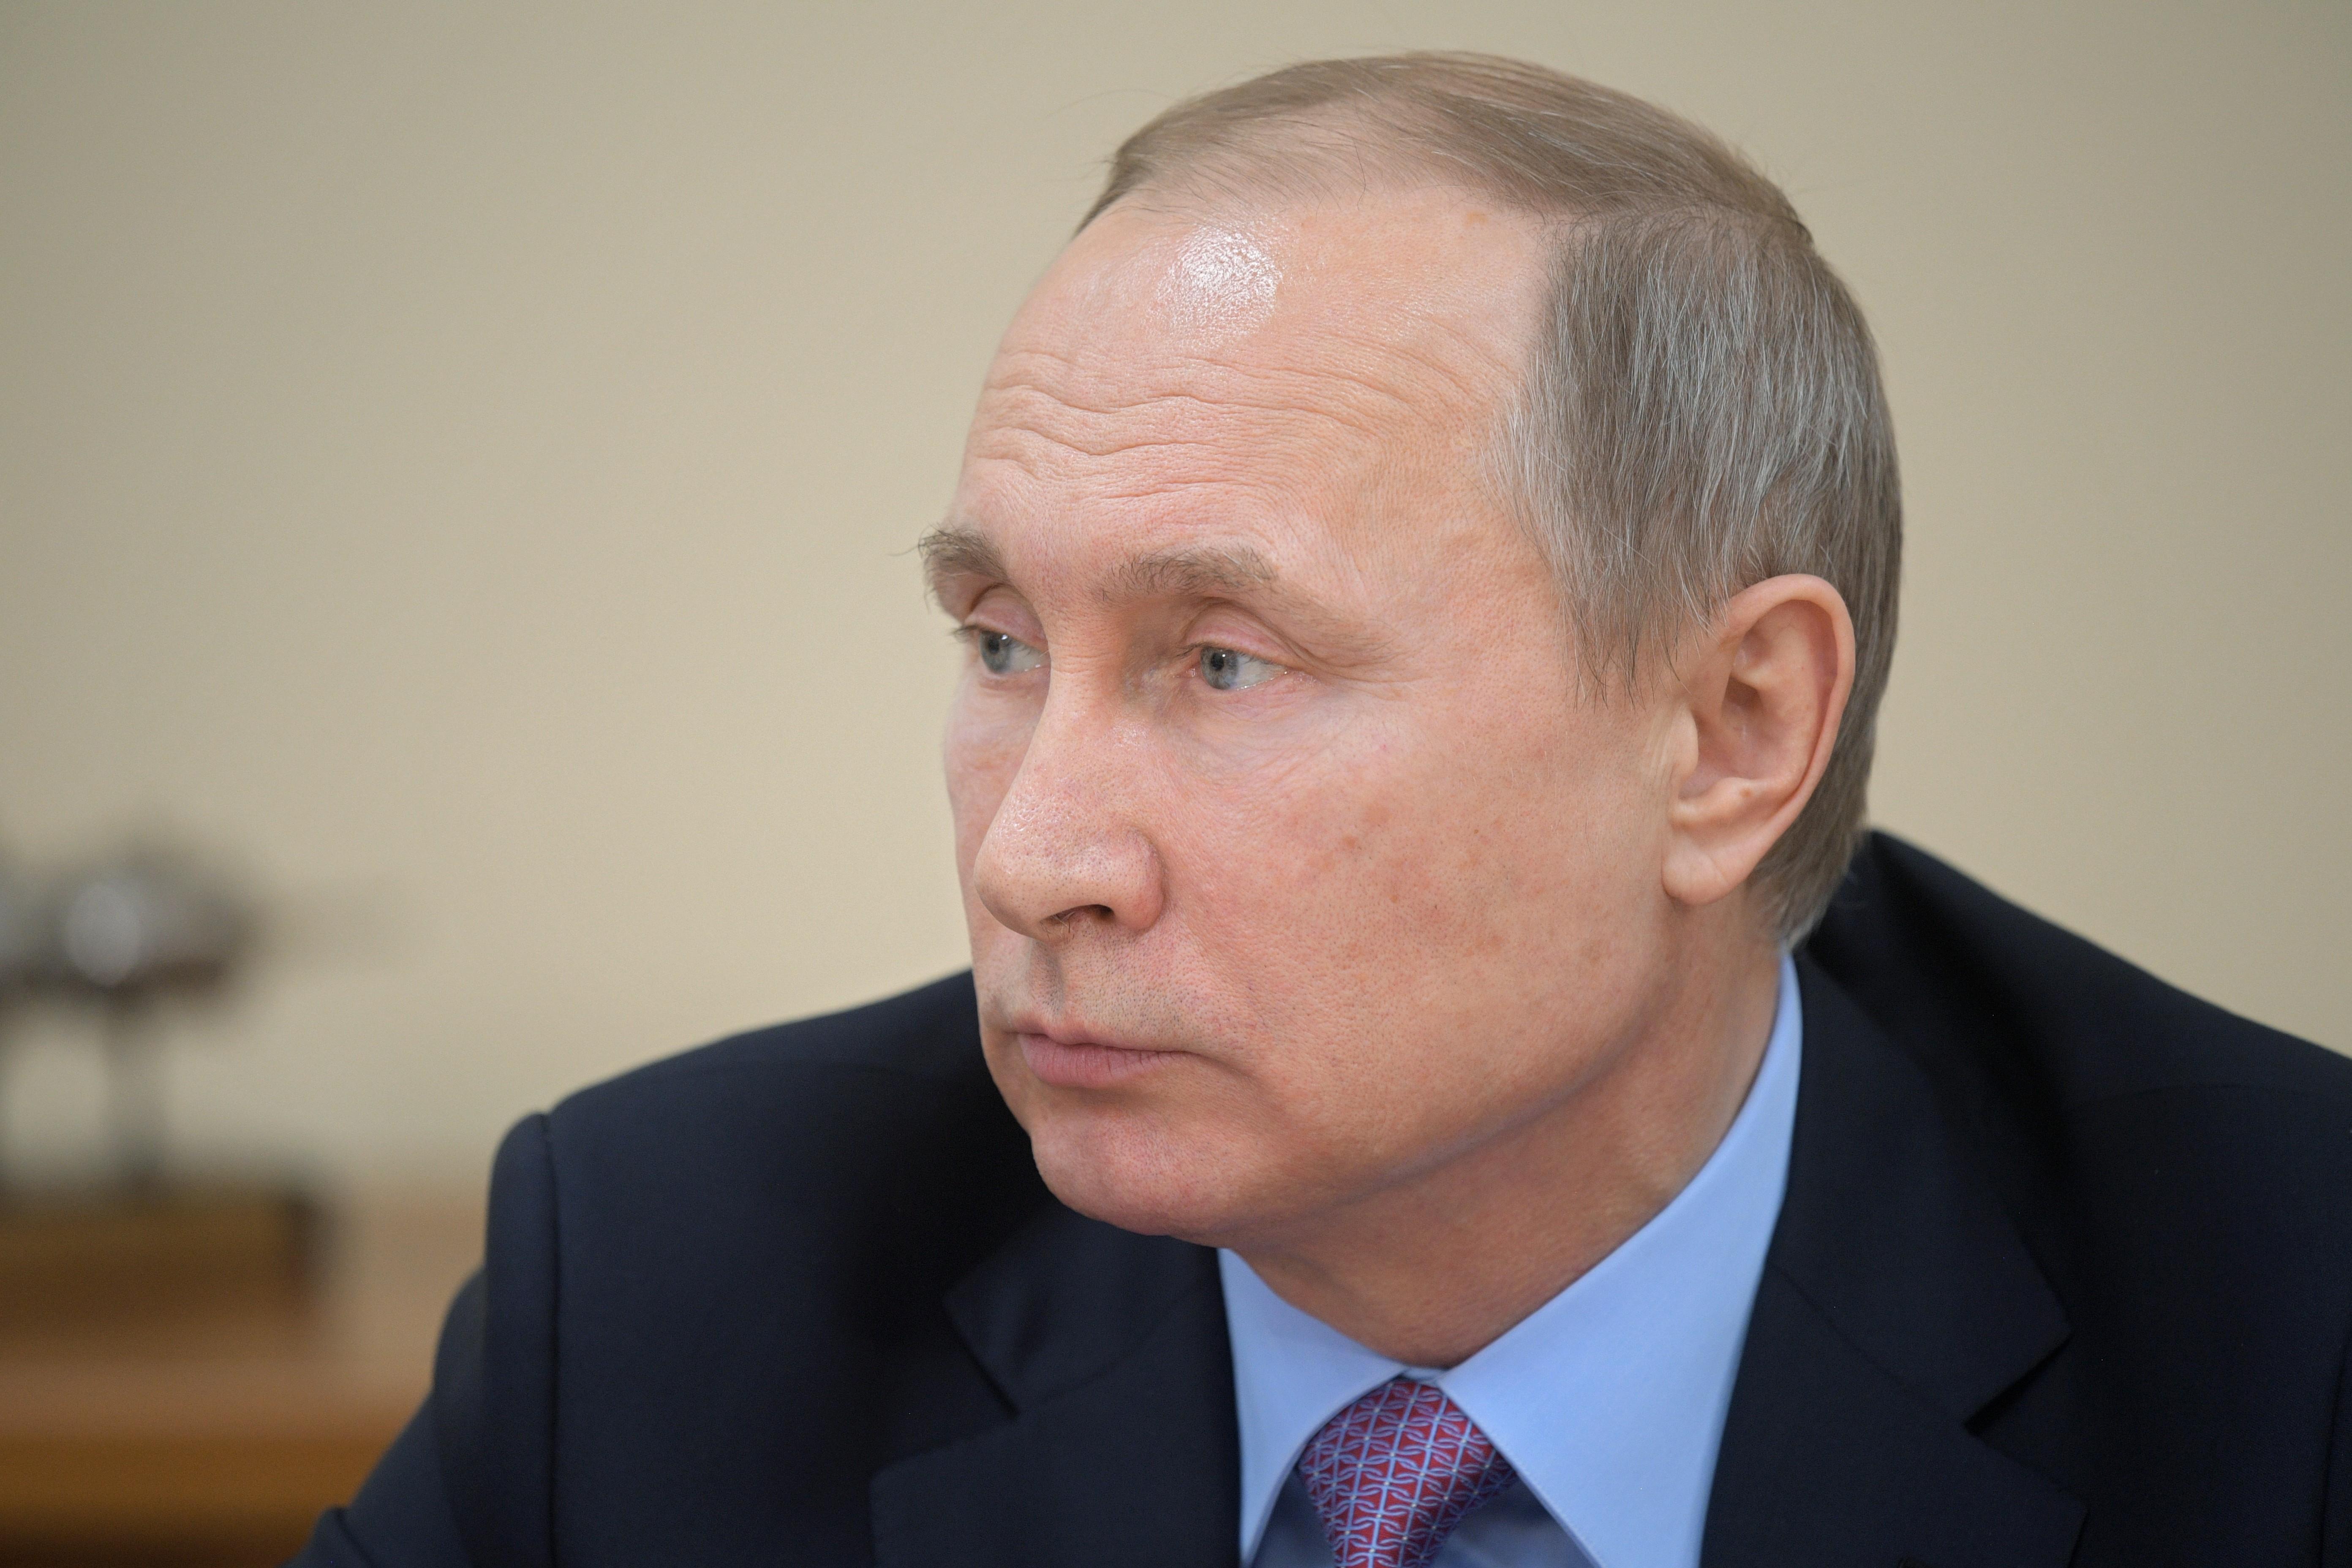 <p>Фото: &copy;РИА Новости /&nbsp;Алексей Дружинин</p>